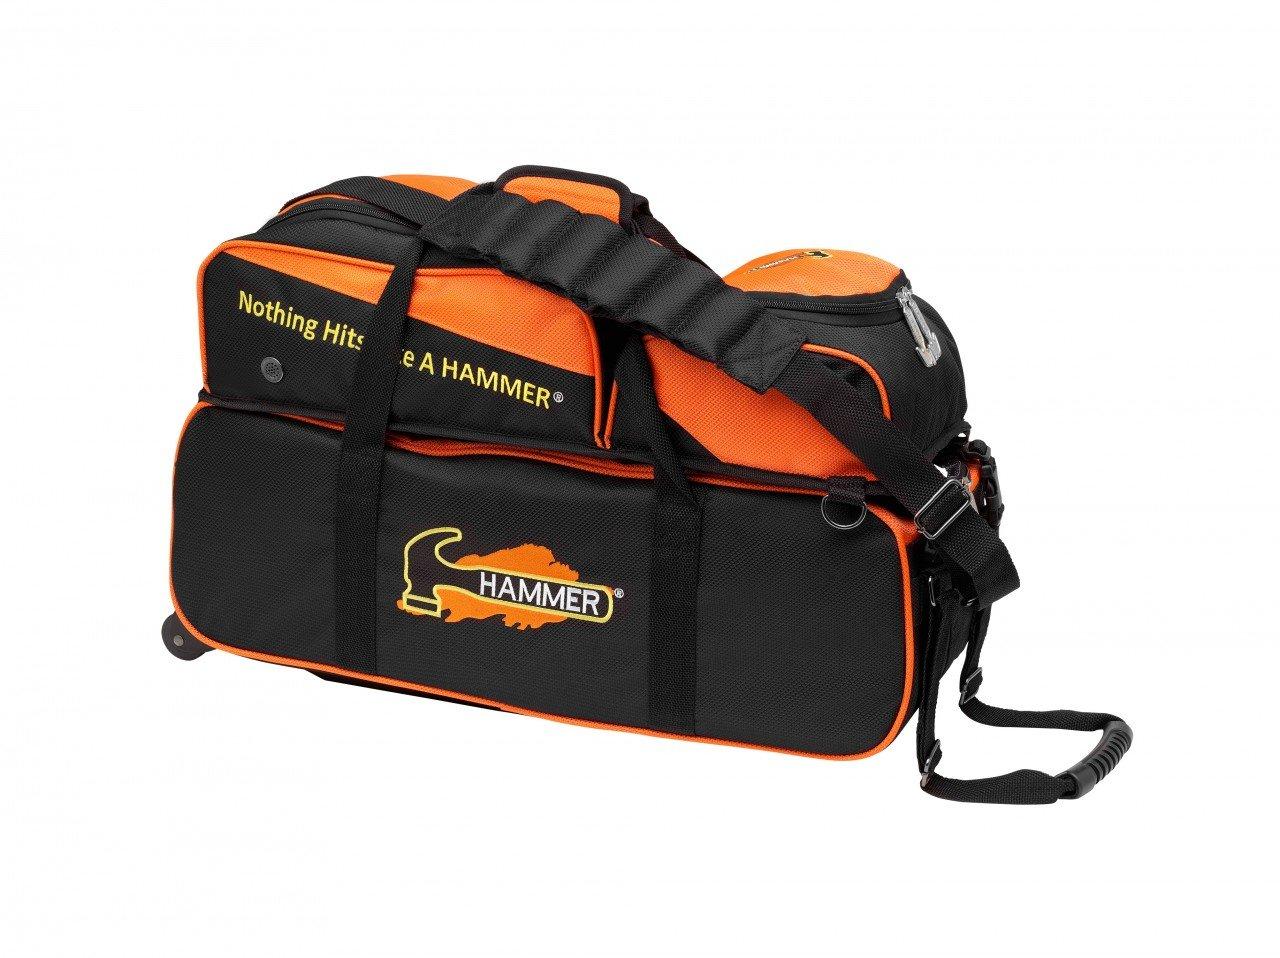 Hammer Premium Triple Roller Bowling Bag, Black/Orange by Hammer